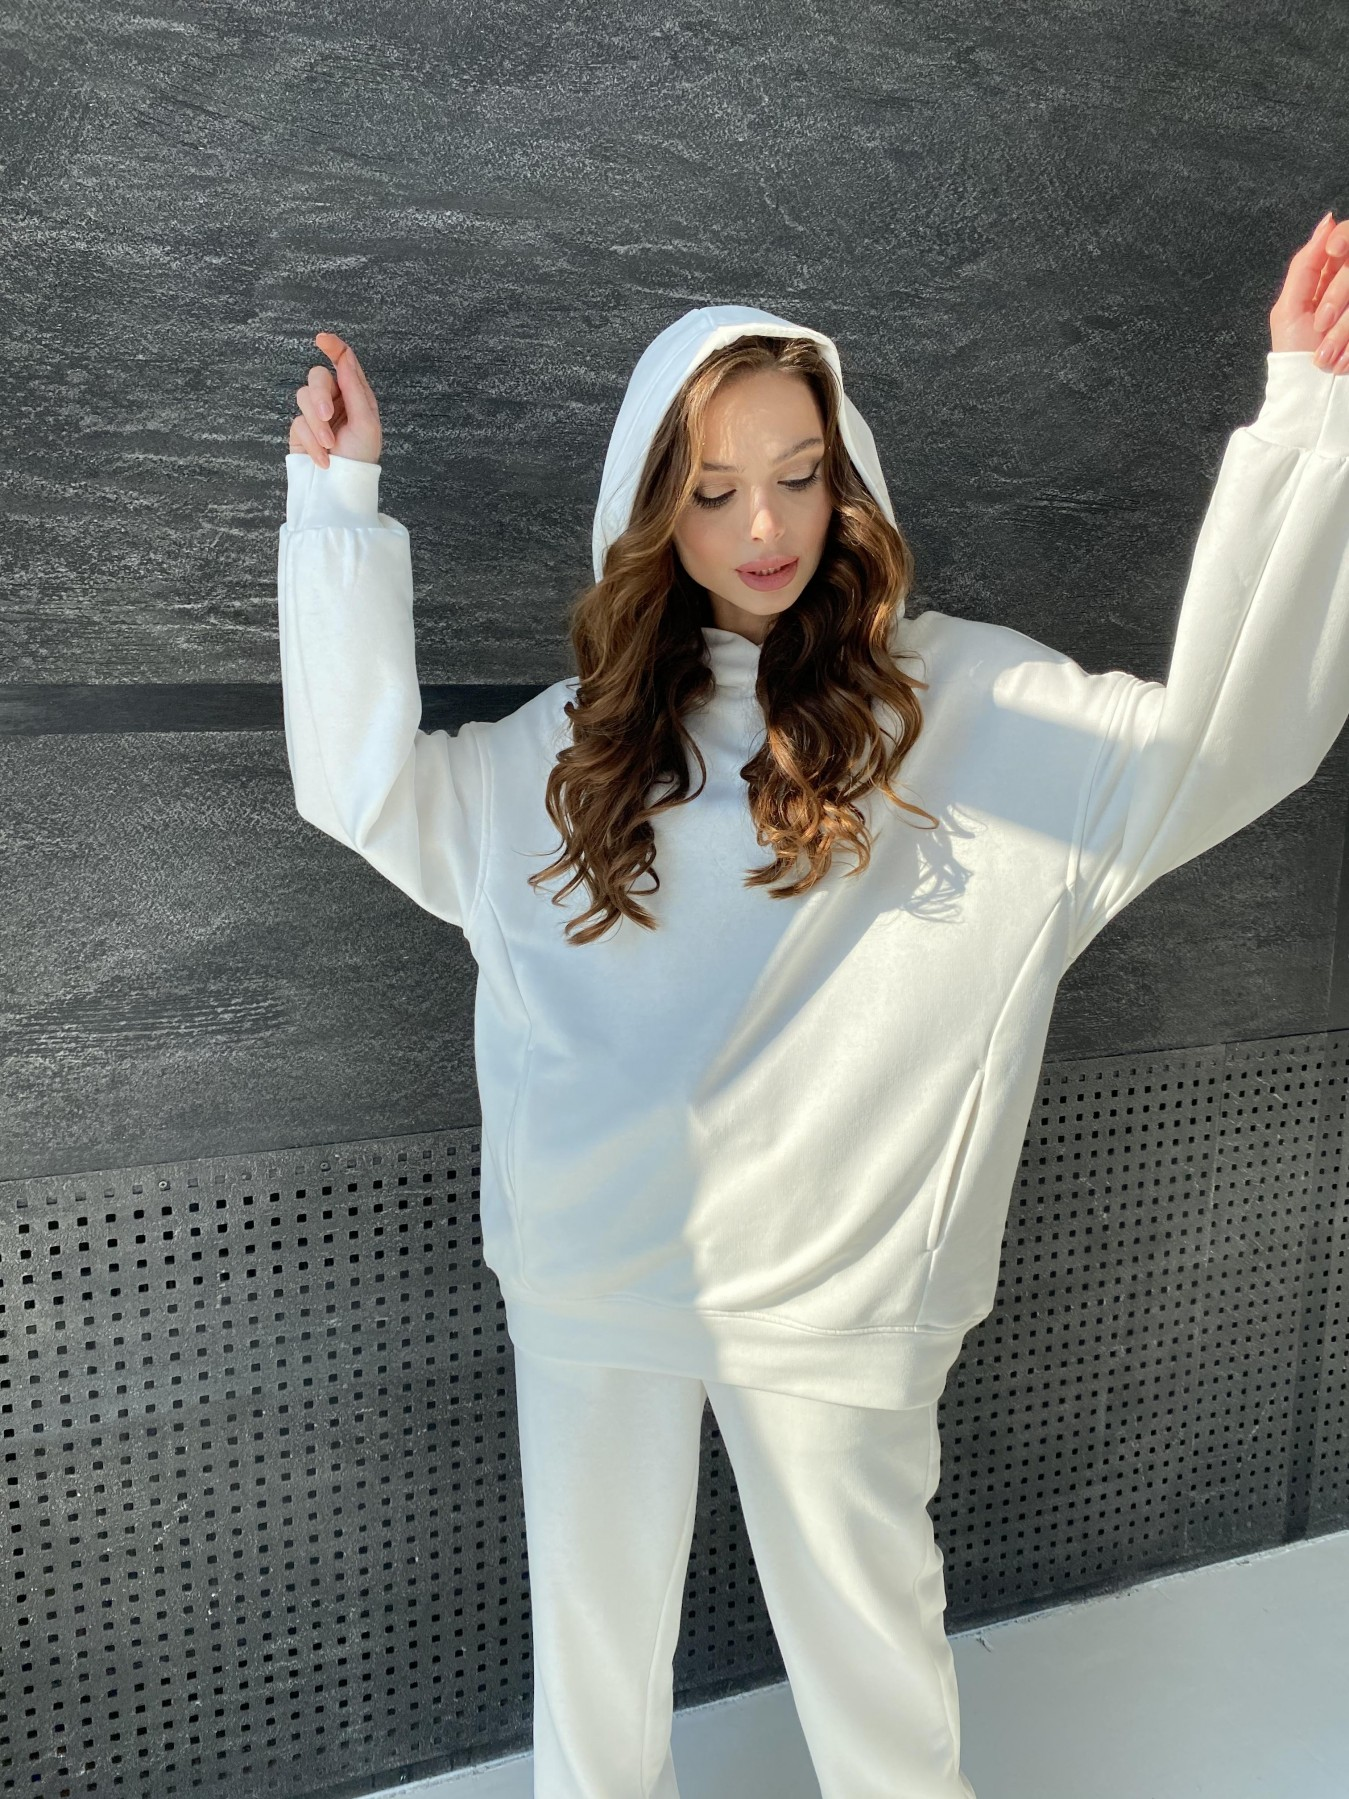 Марион костюм из 3х нитки 10581 АРТ. 47159 Цвет: Молоко - фото 8, интернет магазин tm-modus.ru